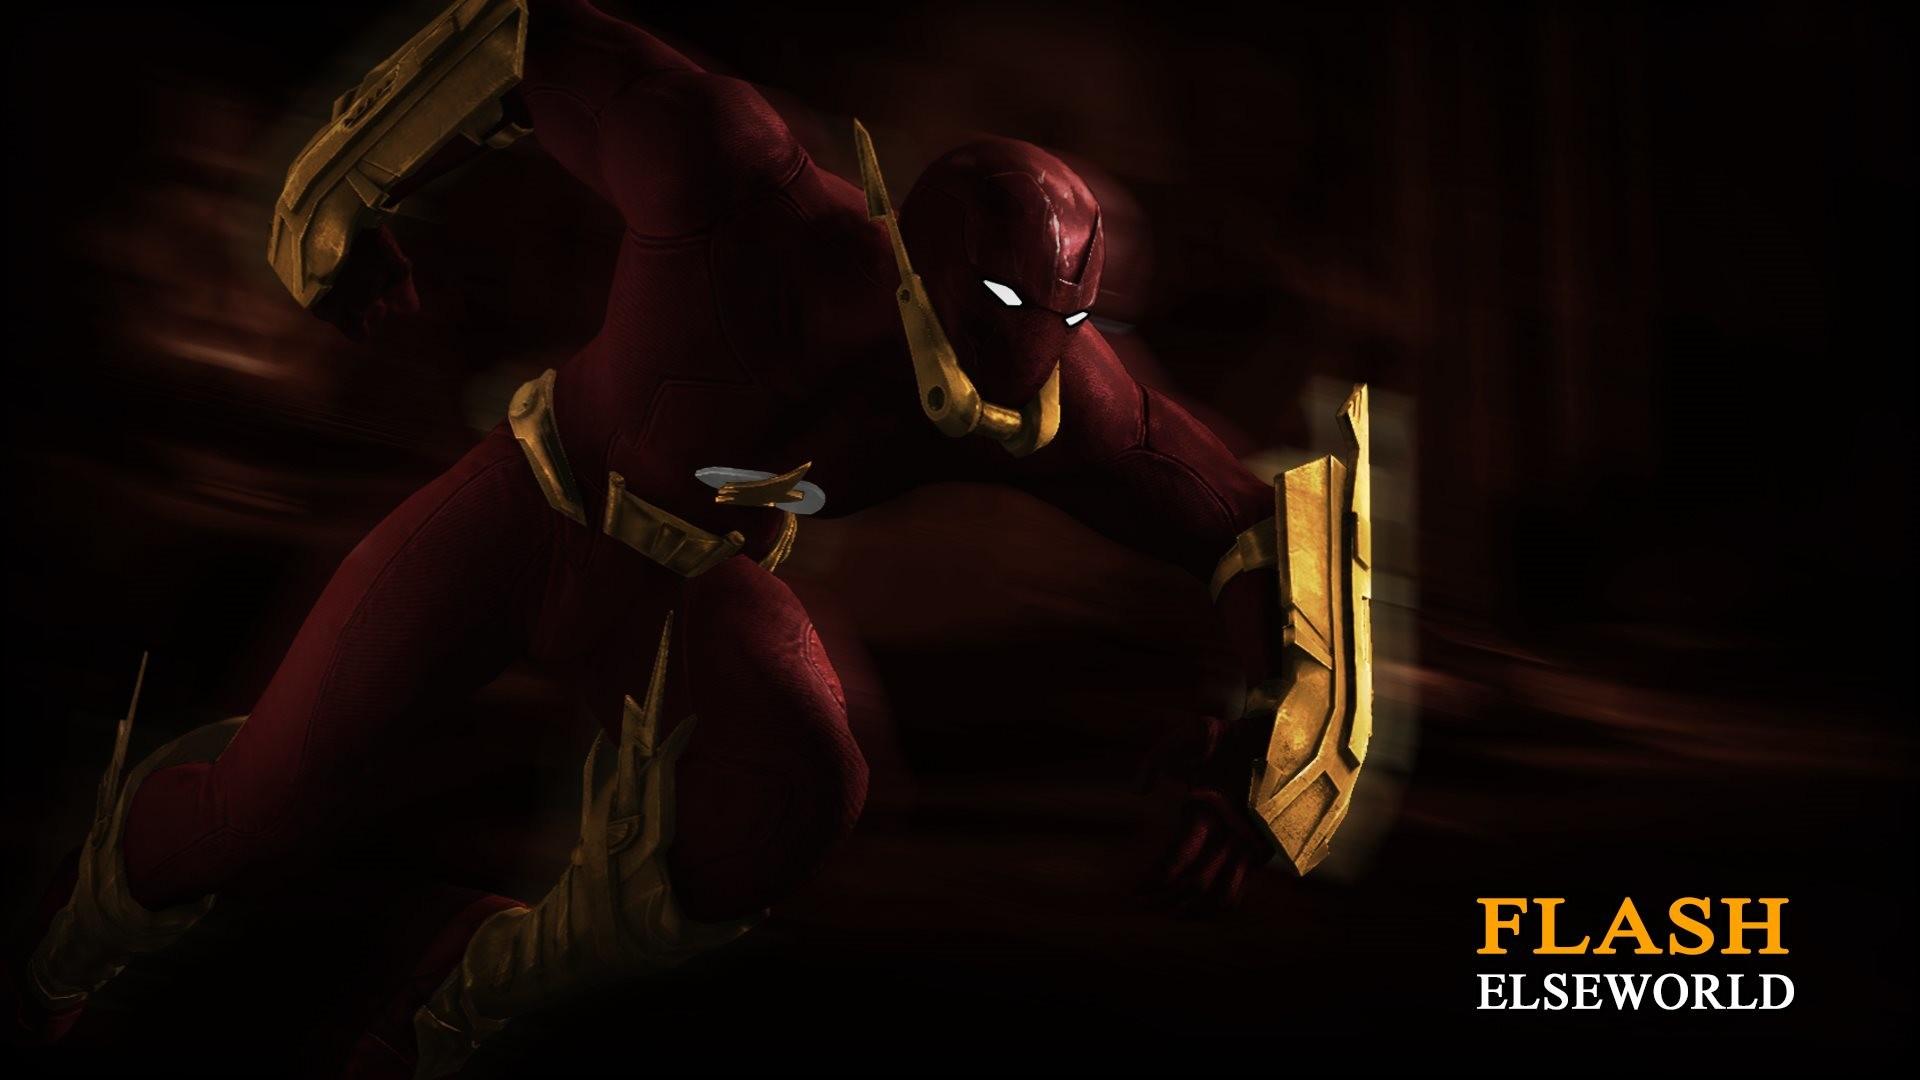 Flash, Arrow, Hawkgirl, Shazam, Batman HD Wallpapers. 4K Wallpapers